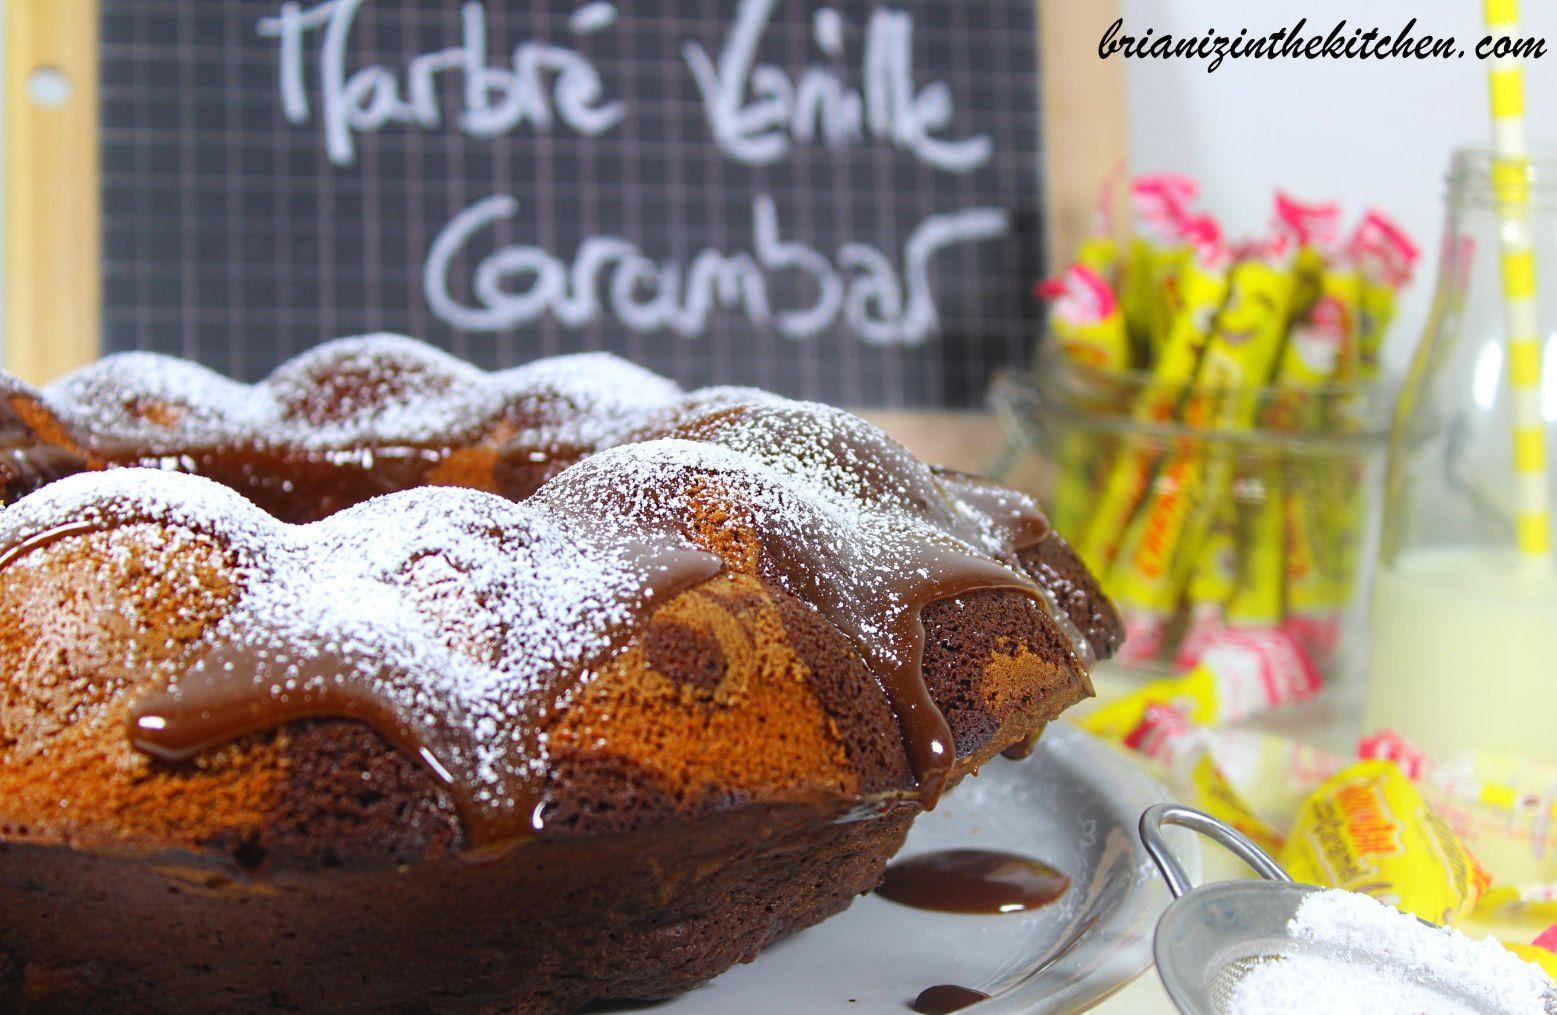 Gâteau Marbré Vanille et Chocolat Carambar